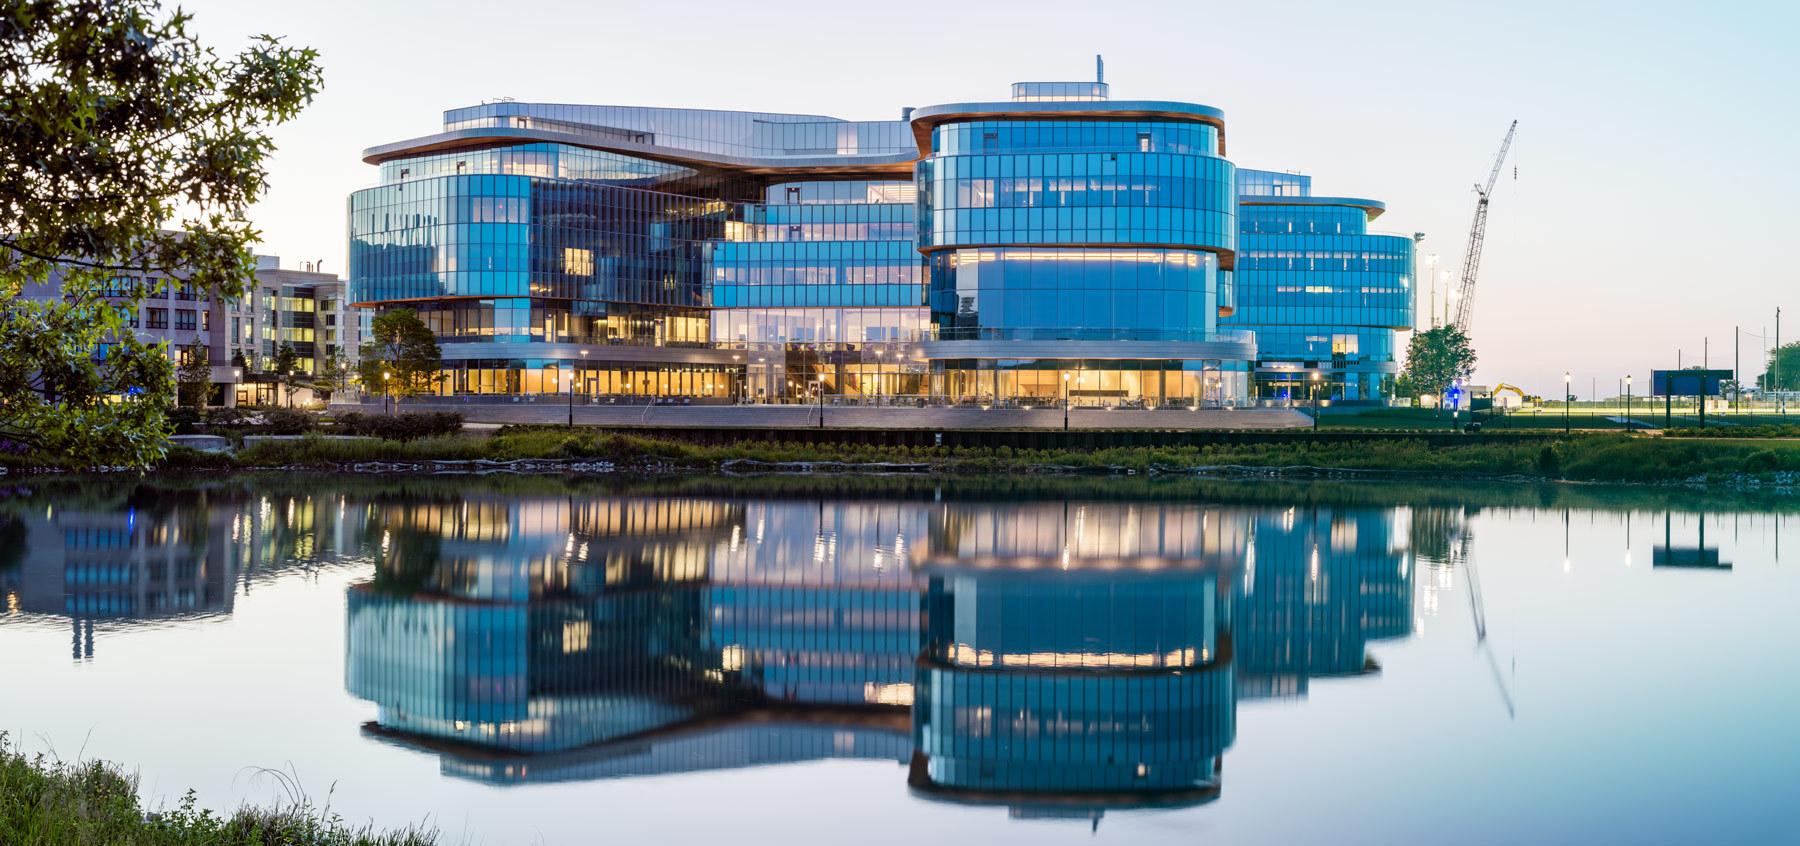 Northwestern University Kellogg School of Management